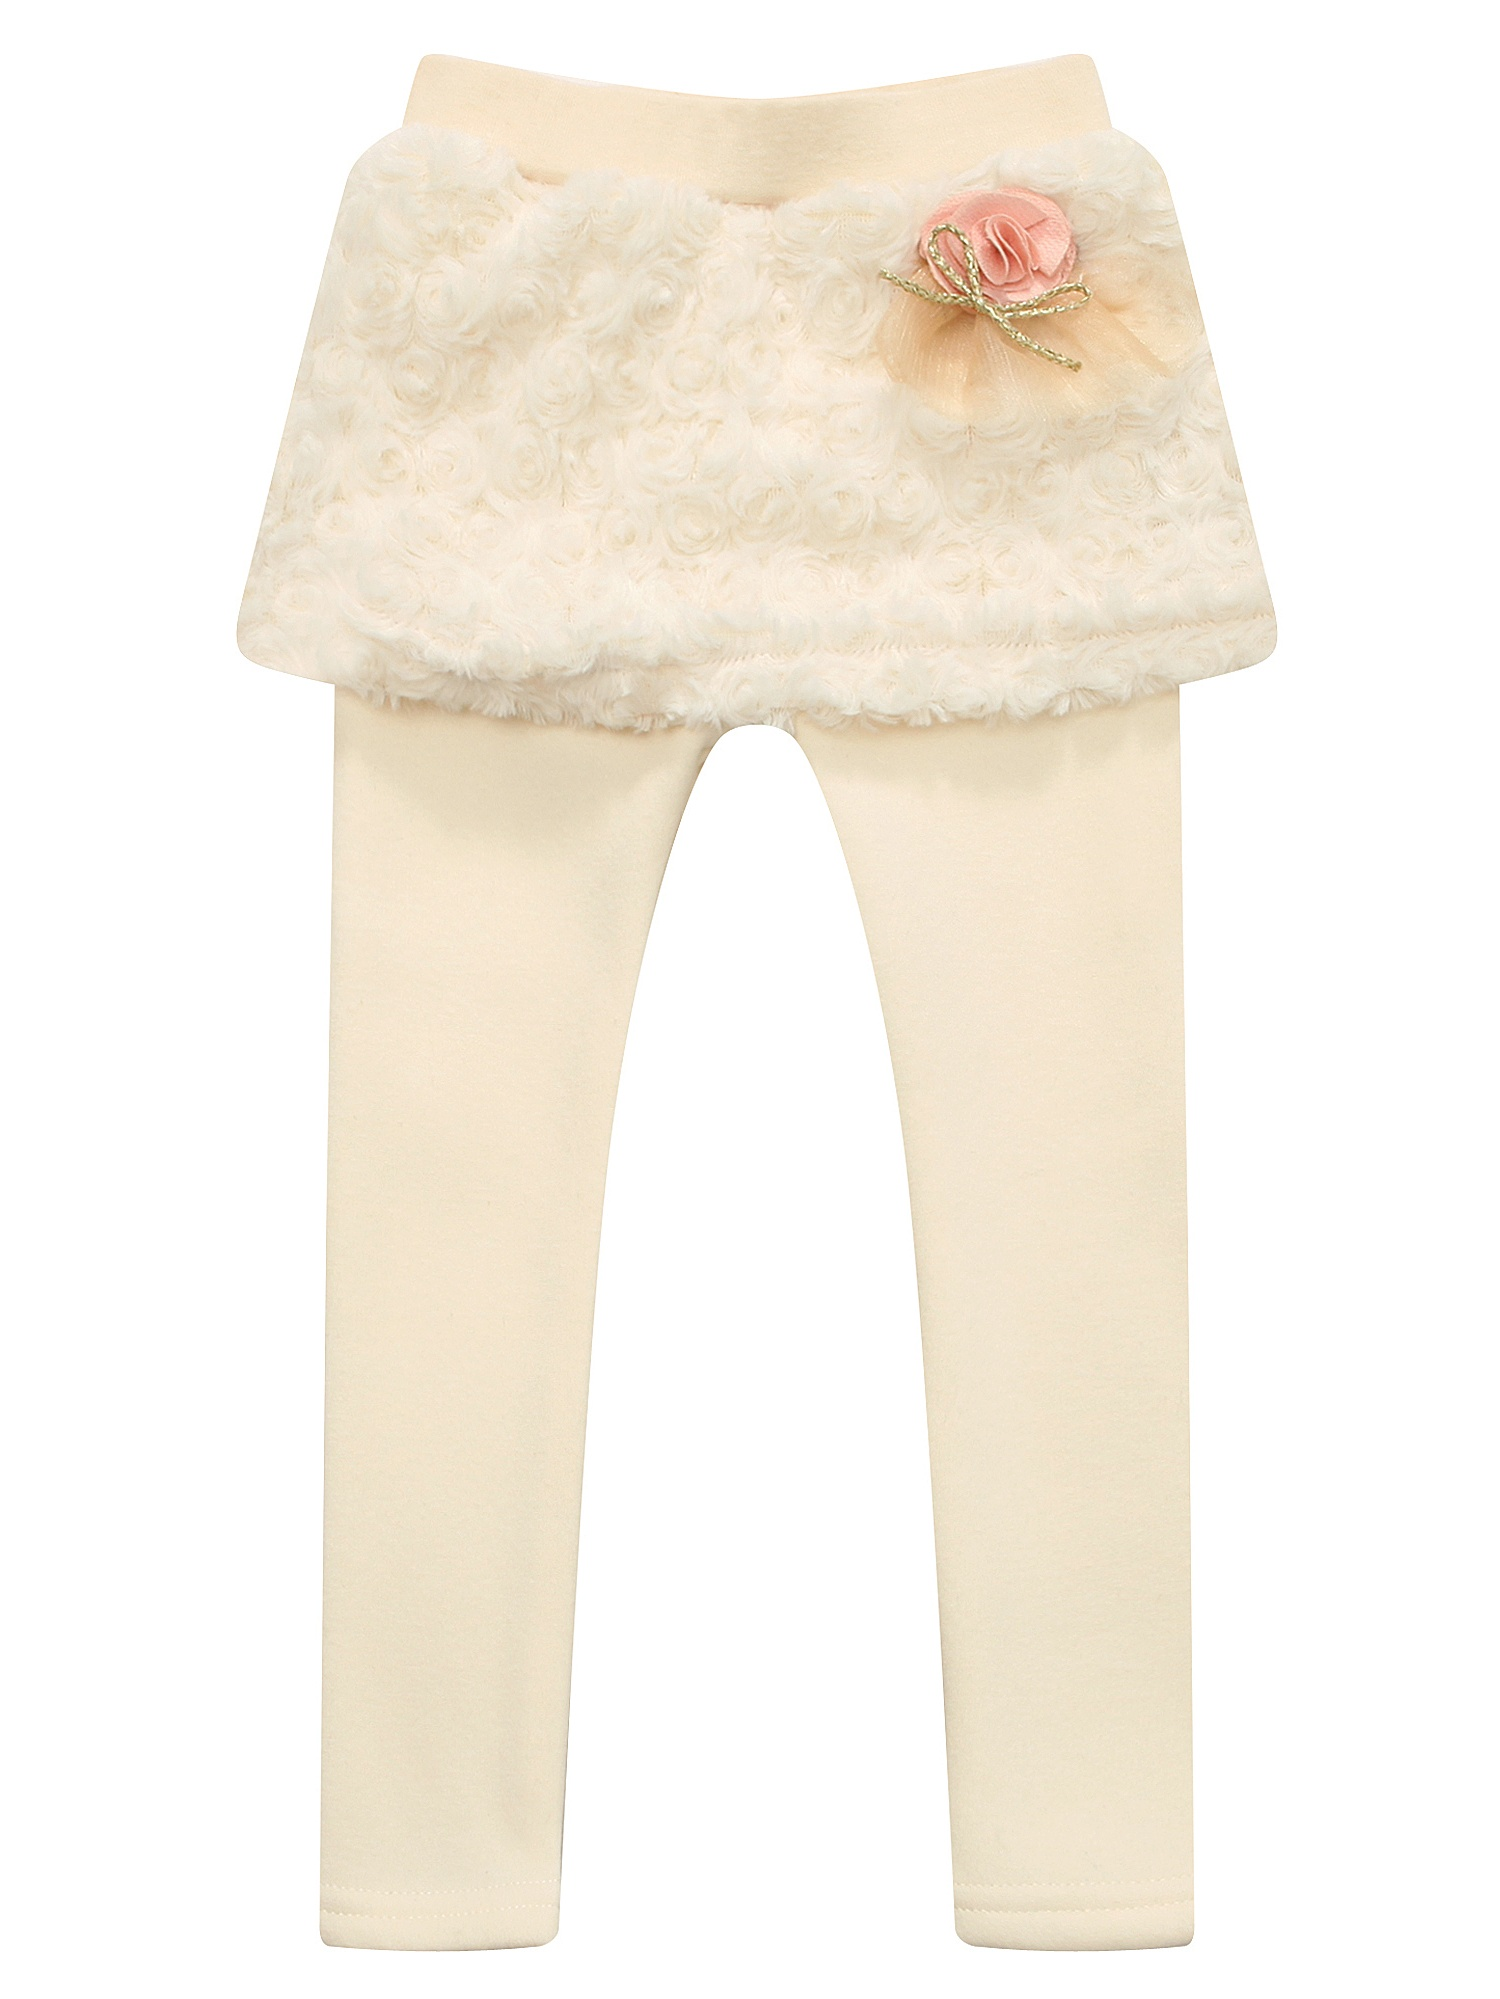 Richie House Girls' Leggings with Matching Skirt RH1418